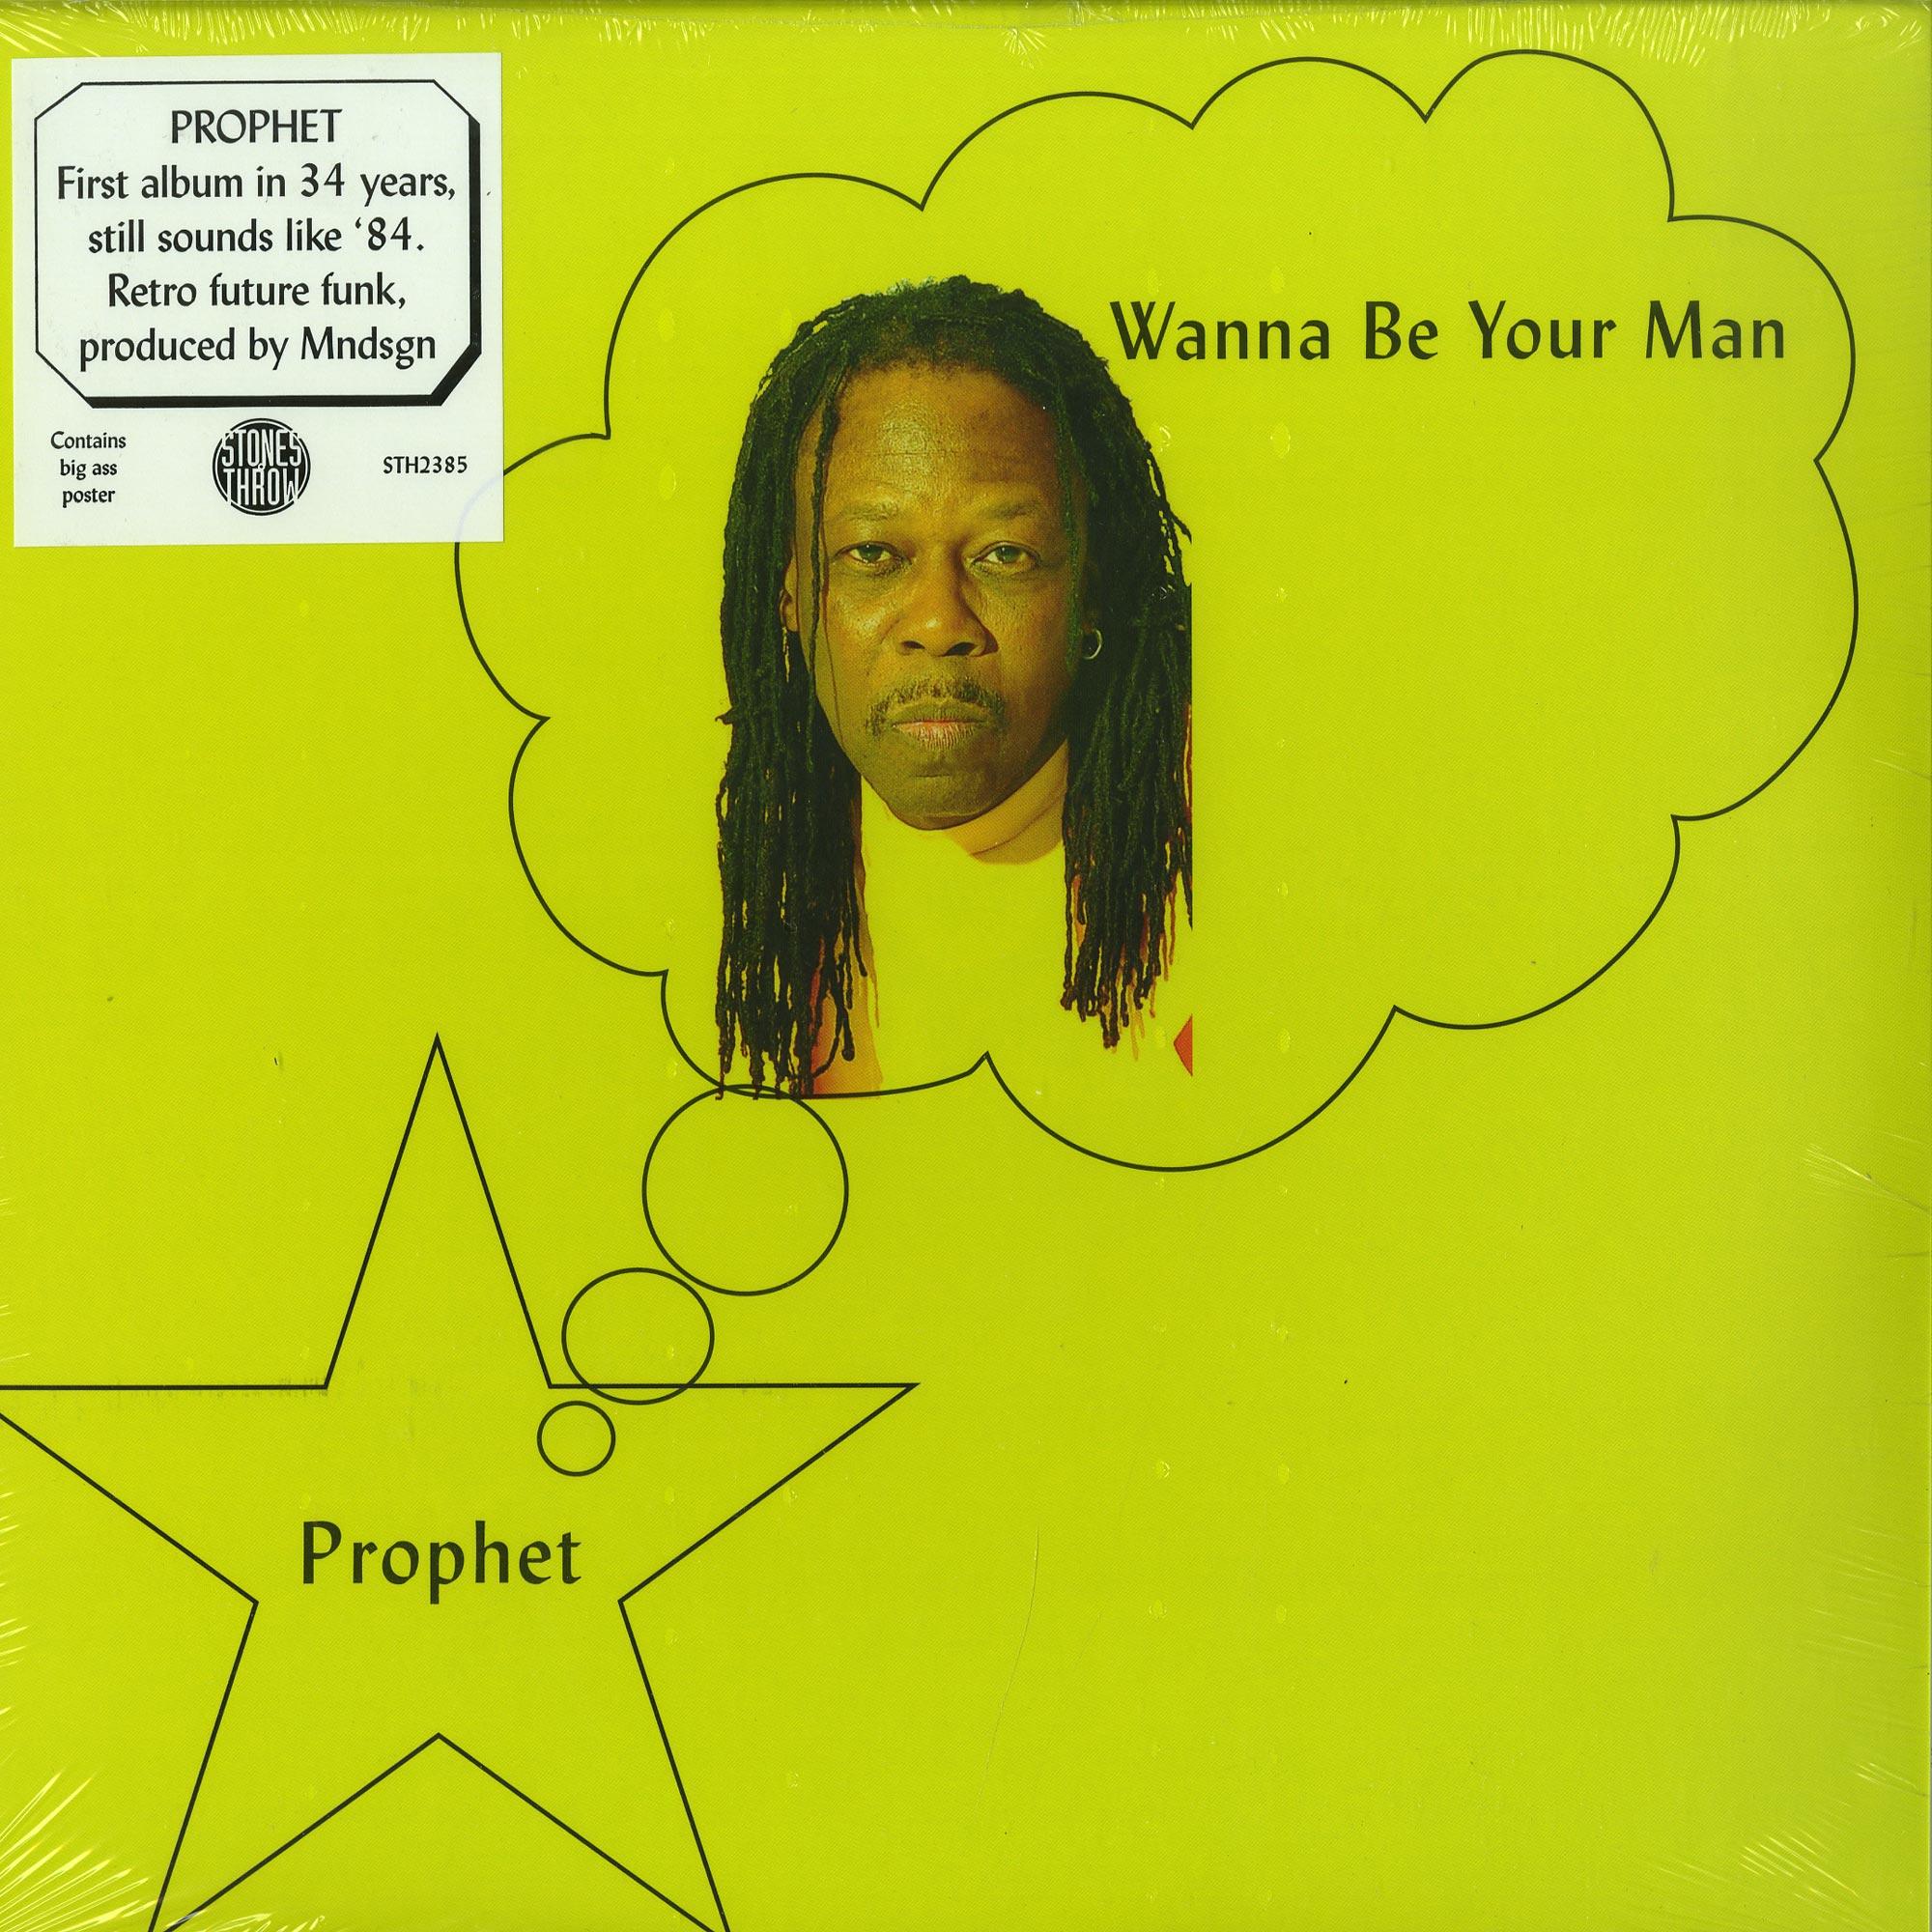 Prophet & Mndsgn - WANNA BE YOUR MAN